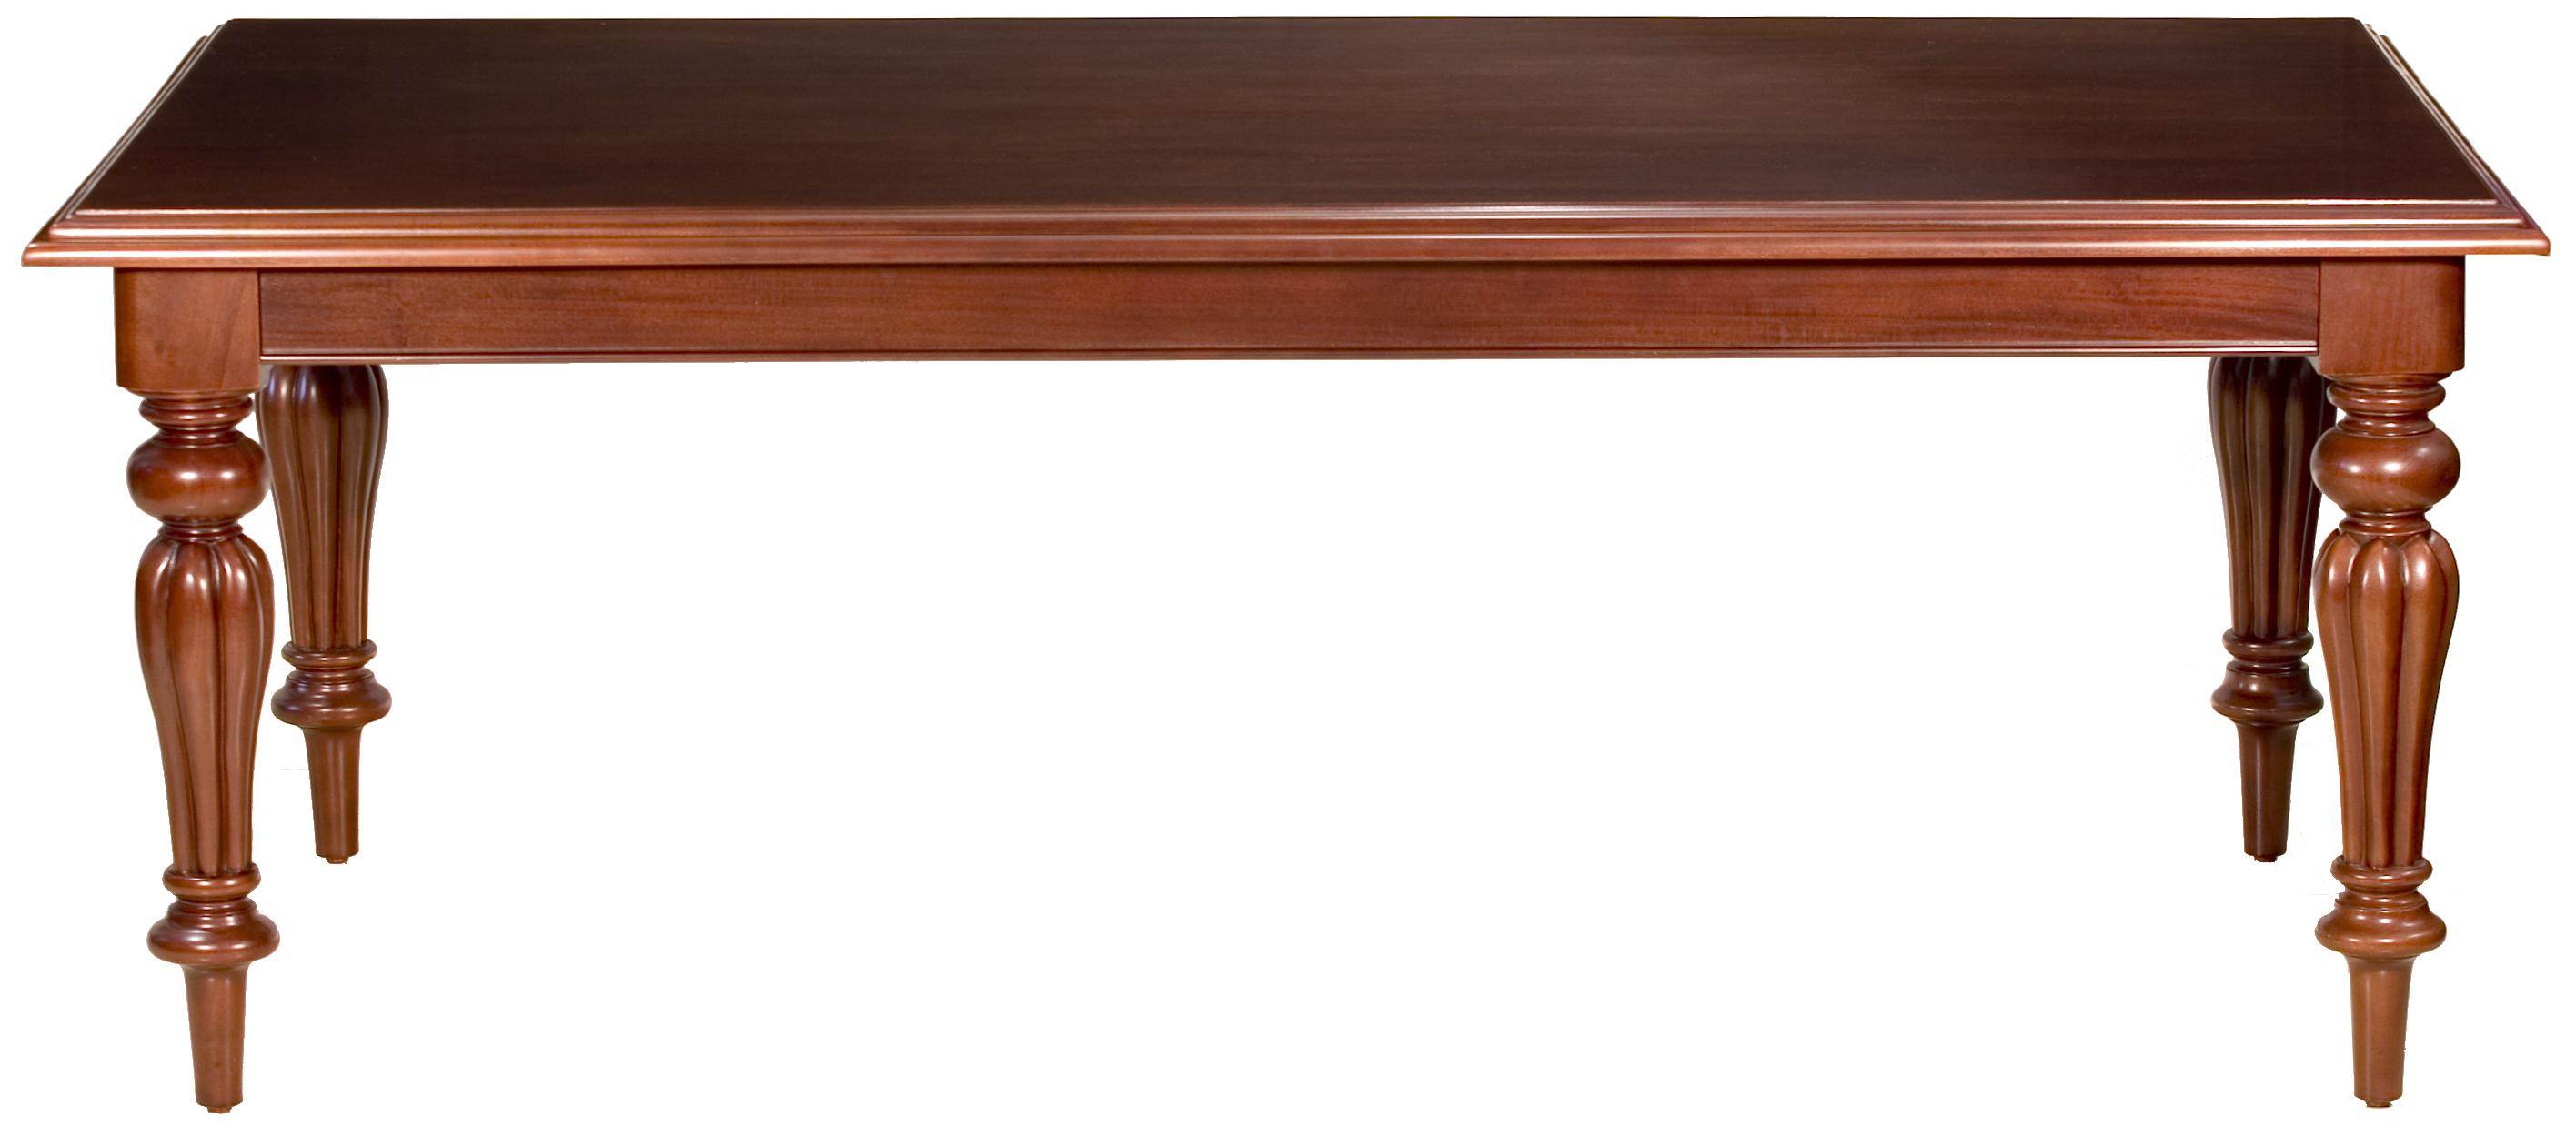 Topolansky Victorian Dining Table 200x110